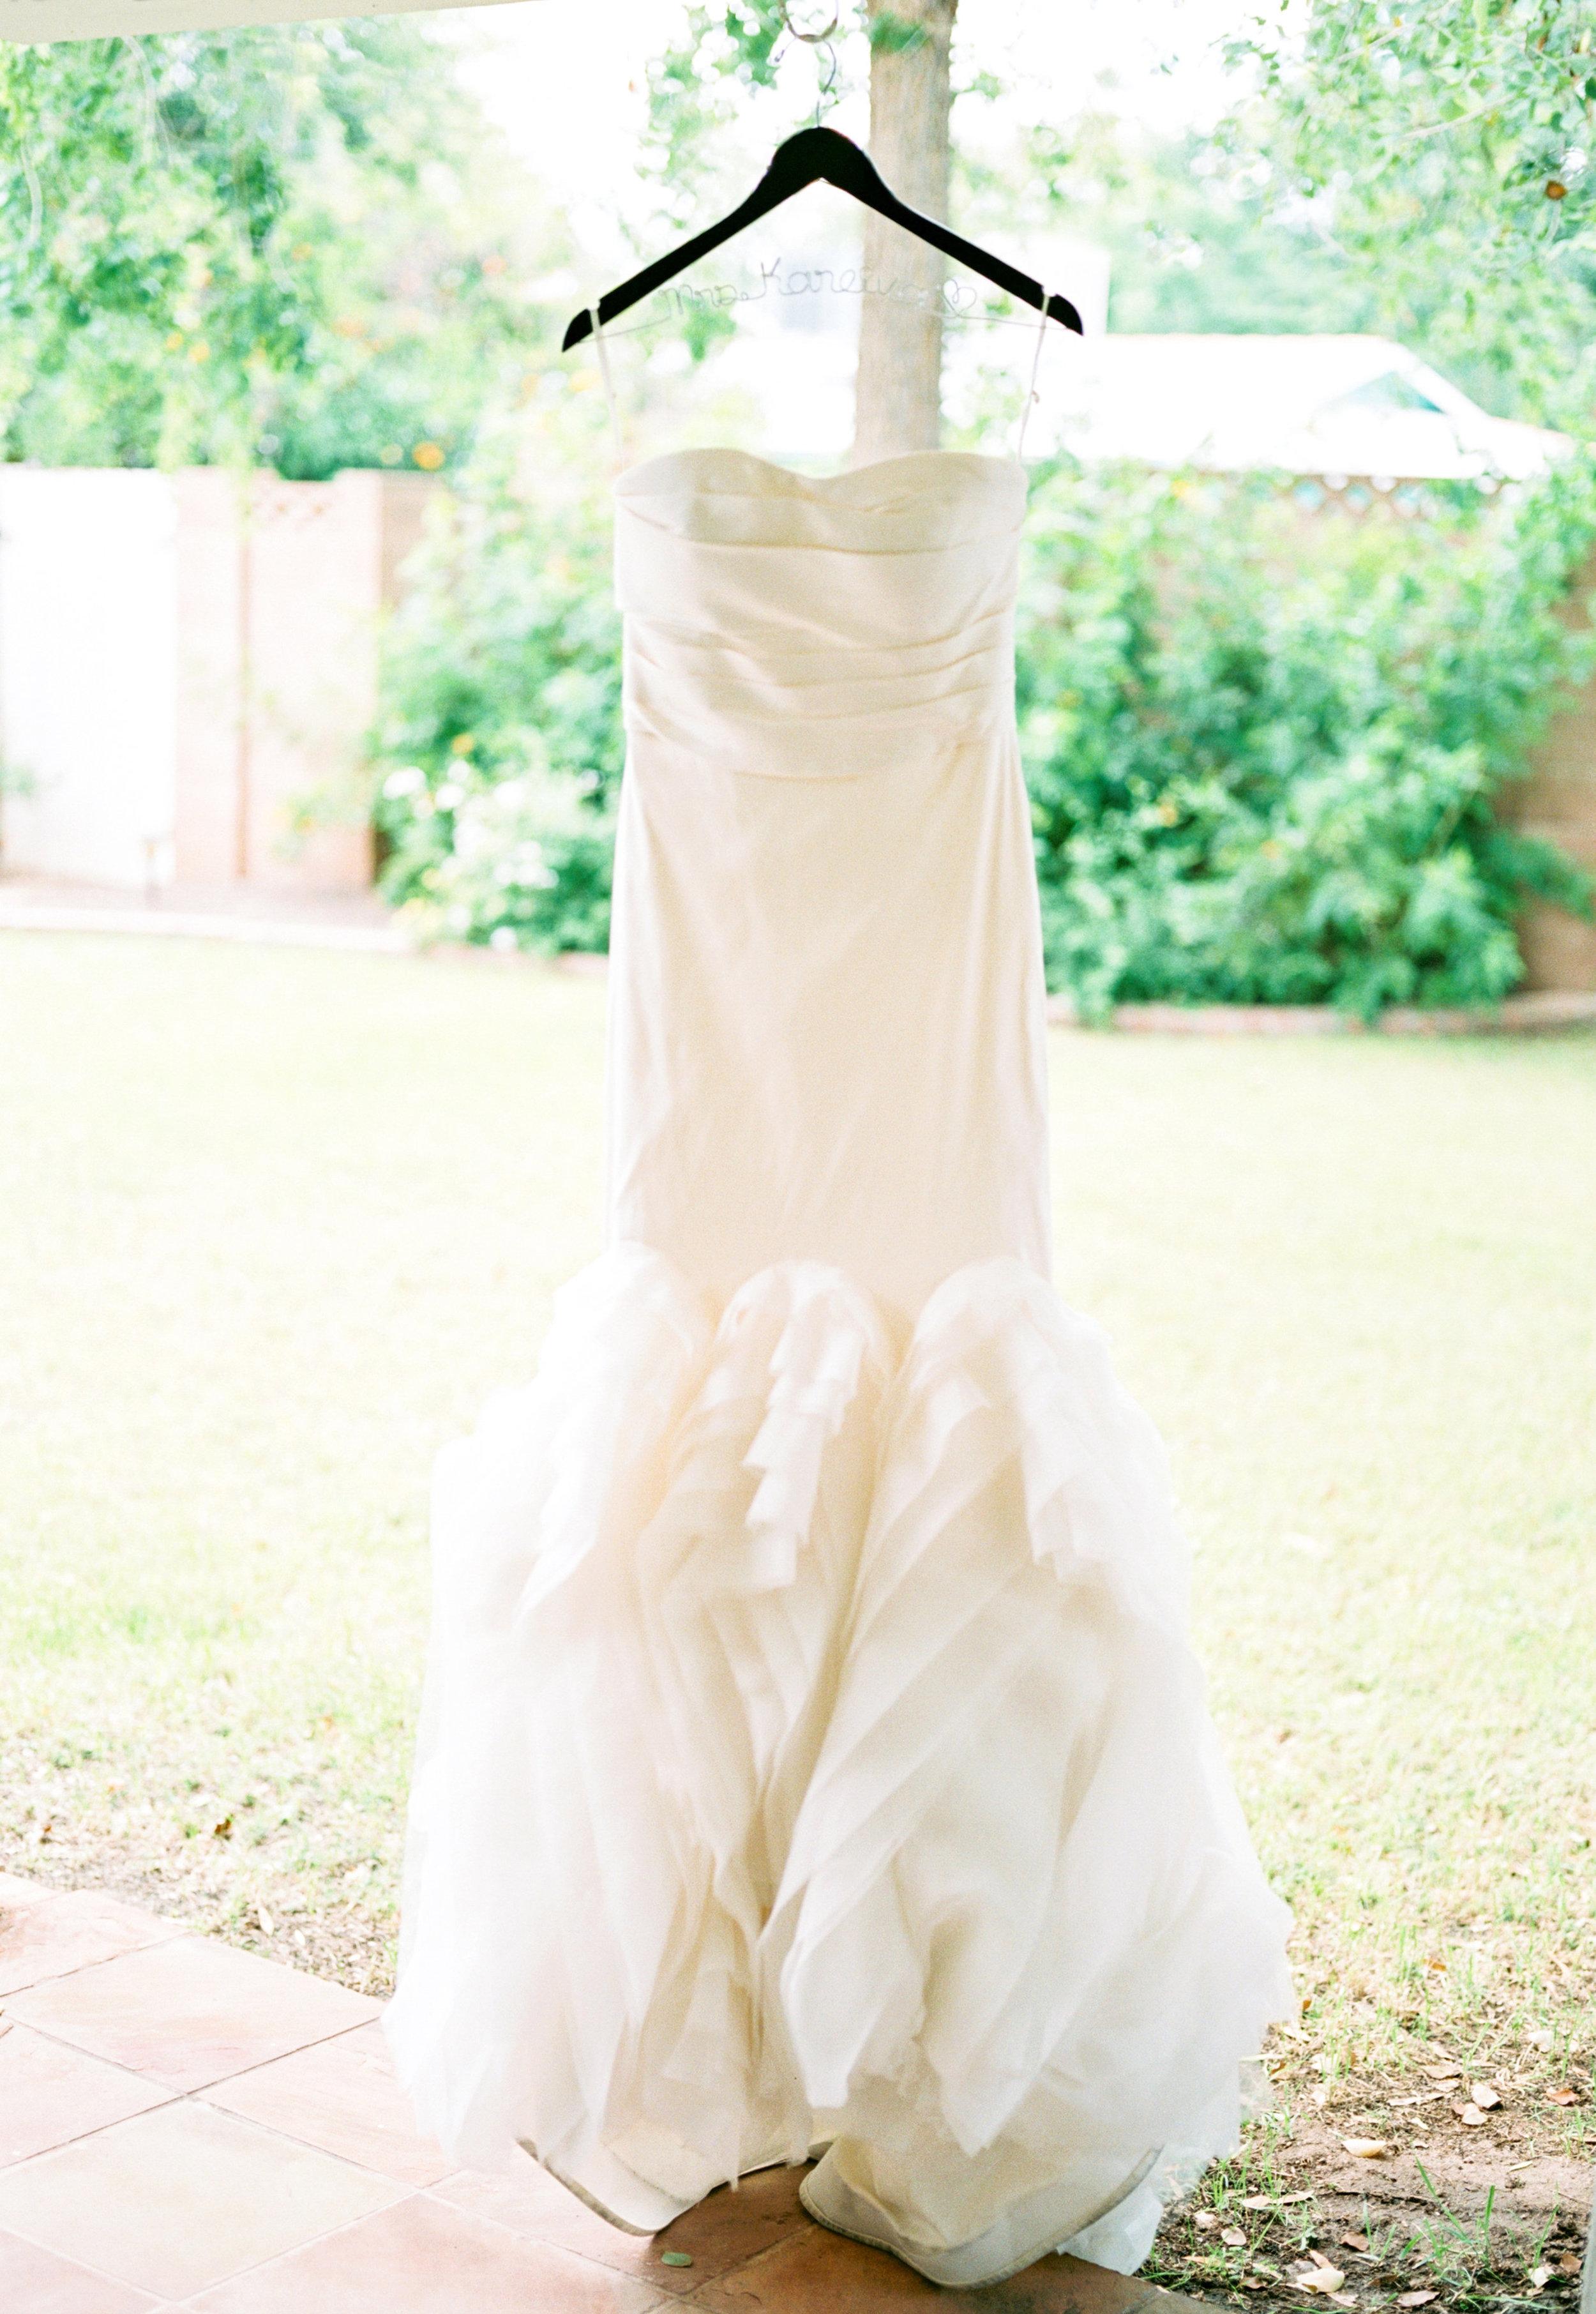 Wedding dress, ivory wedding dress, Vera Wang wedding dress, wedding dress hanger